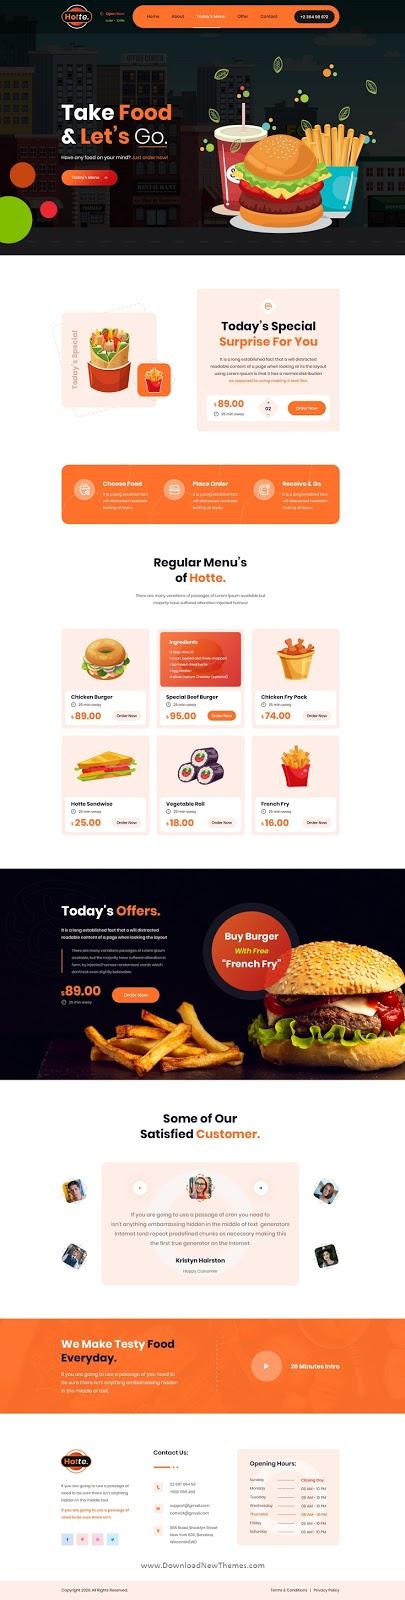 Take Away Food Website Template